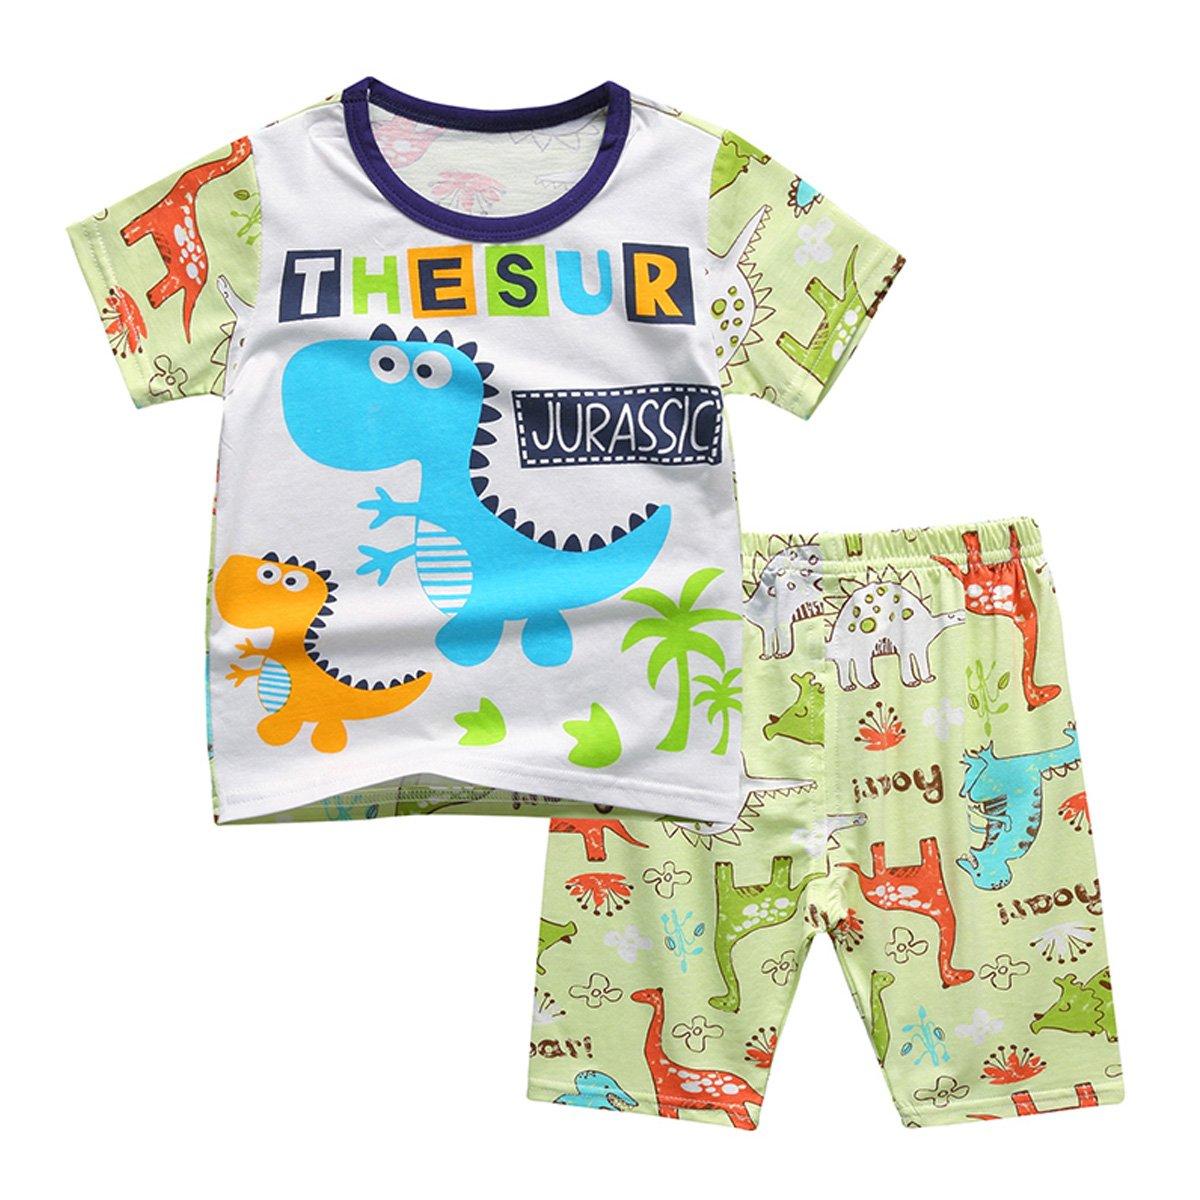 OnlyAngel Little Boys Cute Dinosaur Short Sleeve Cotton T Shirts /& Shorts Set Age 1-8